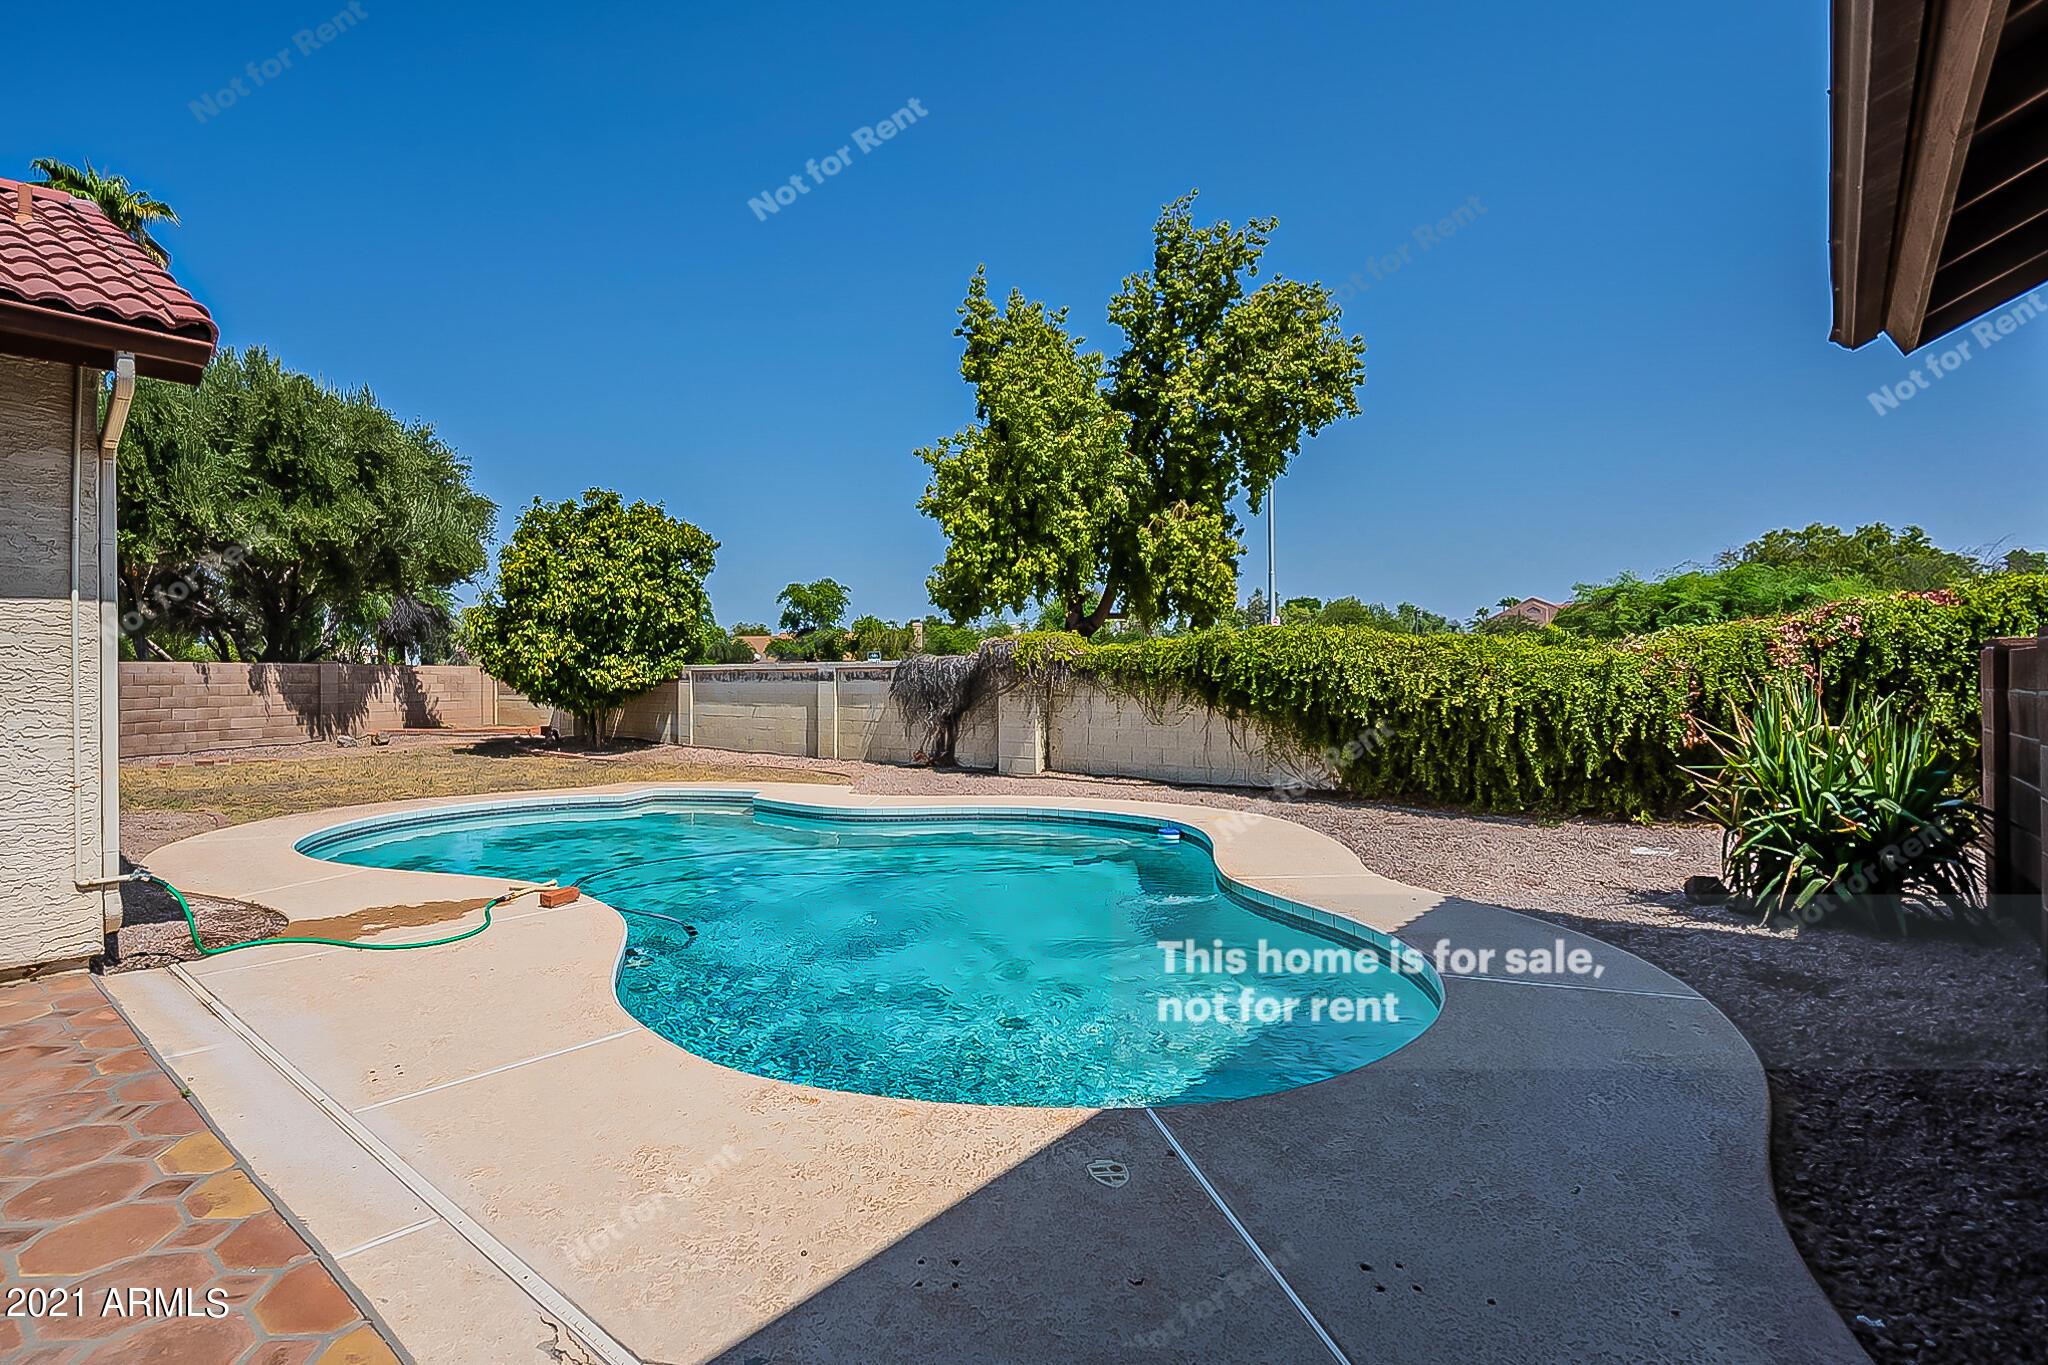 MLS 6296670 1409 N ALDER Drive, Chandler, AZ 85226 Community Pool